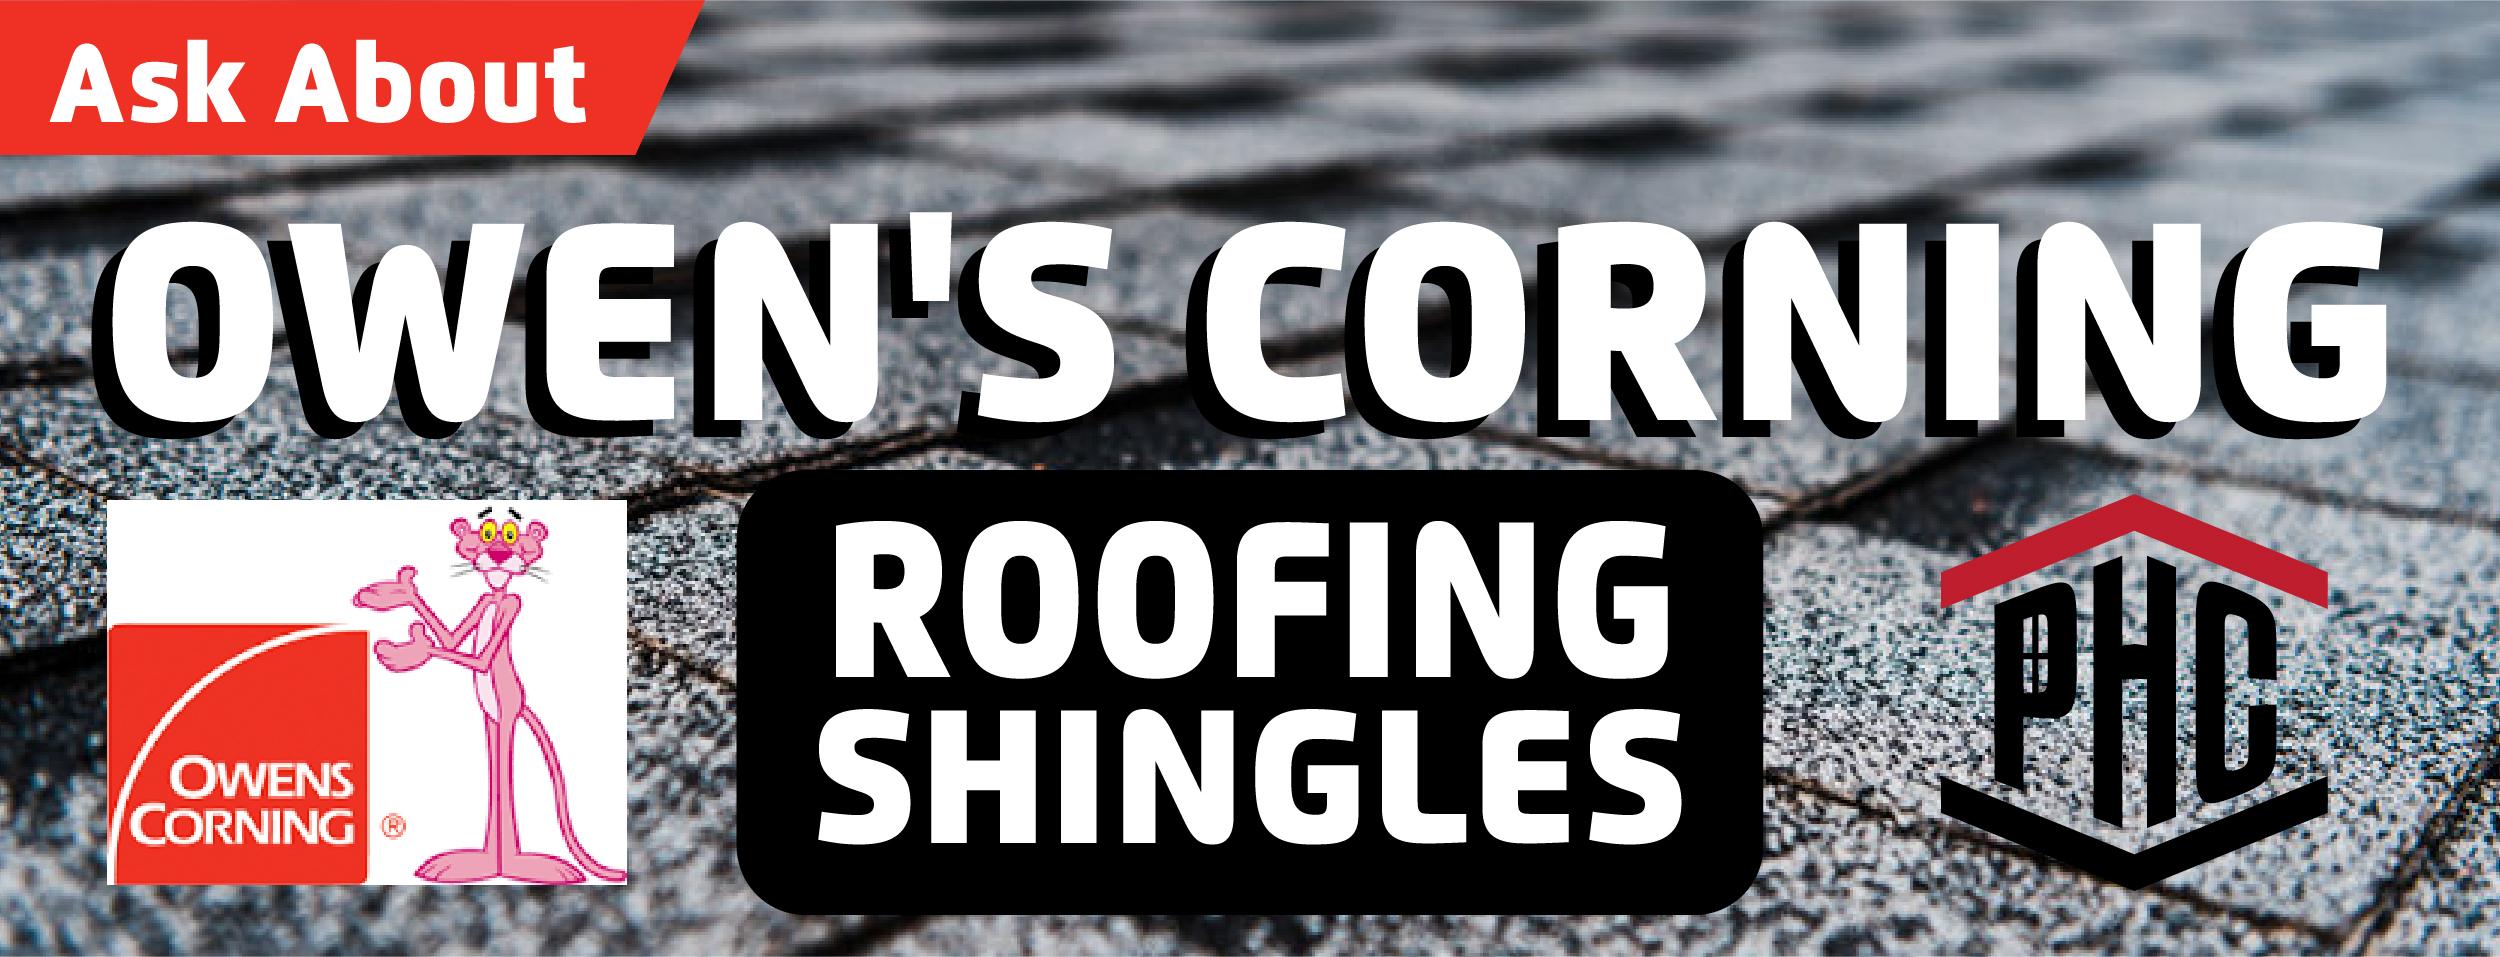 Owens-Corning-Shingles-ABQ